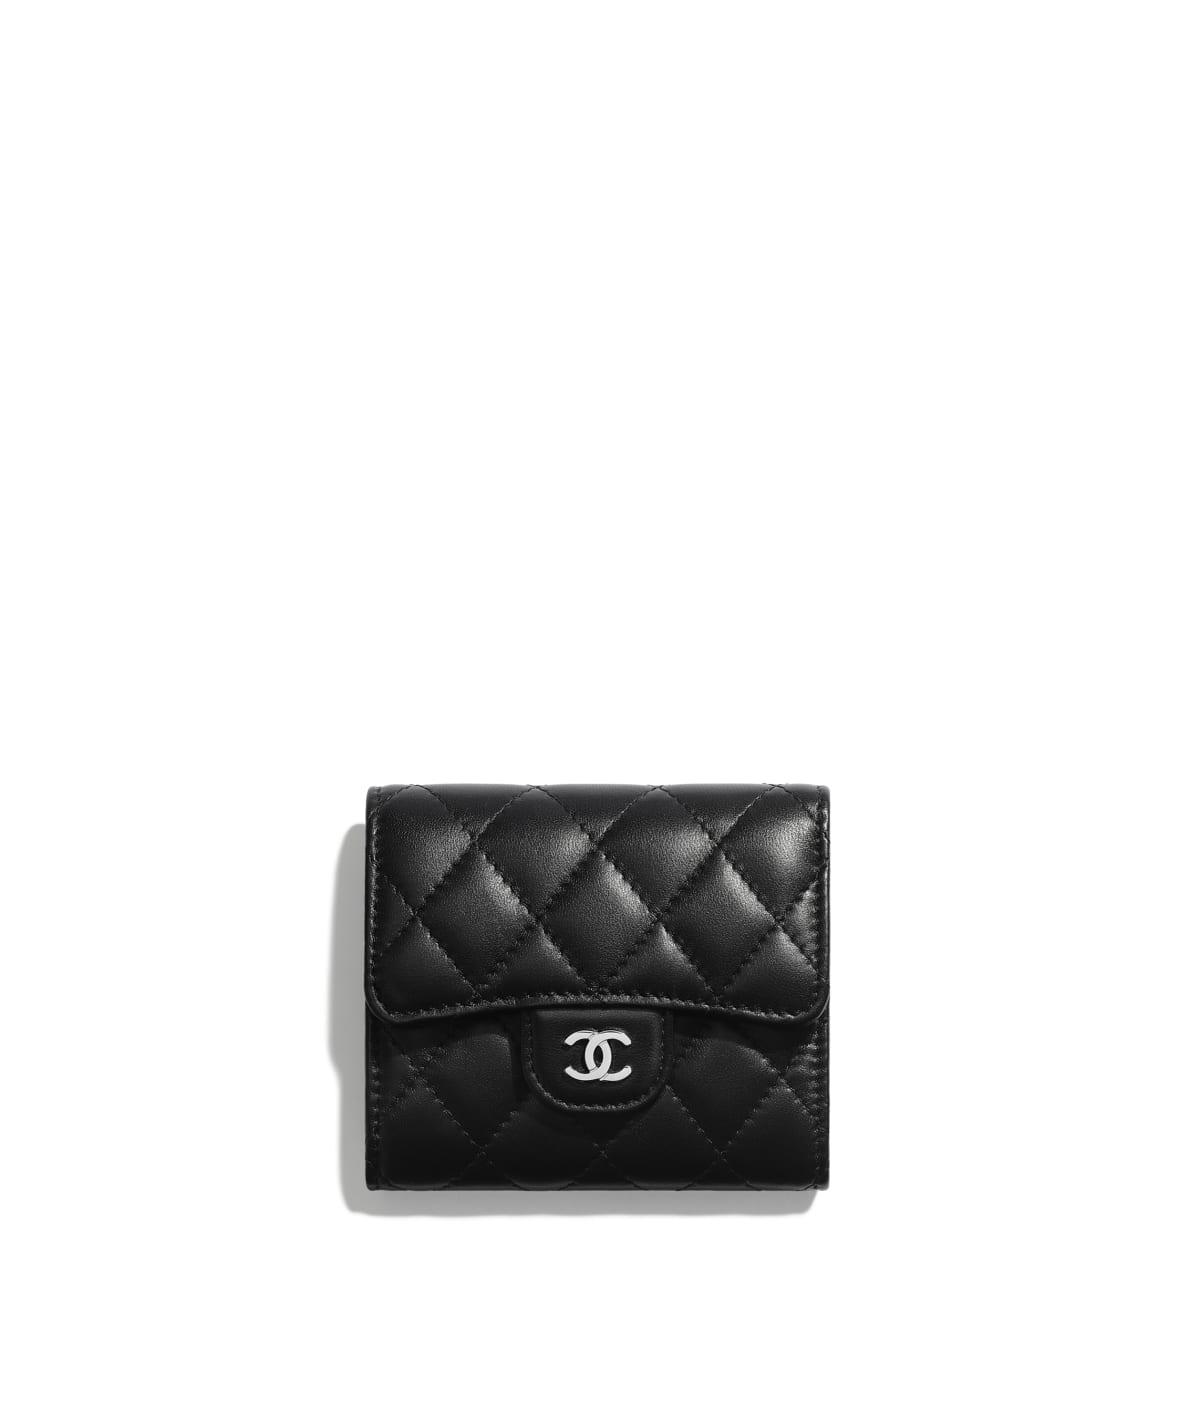 8f1160787bd8 Classic Small Flap Wallet